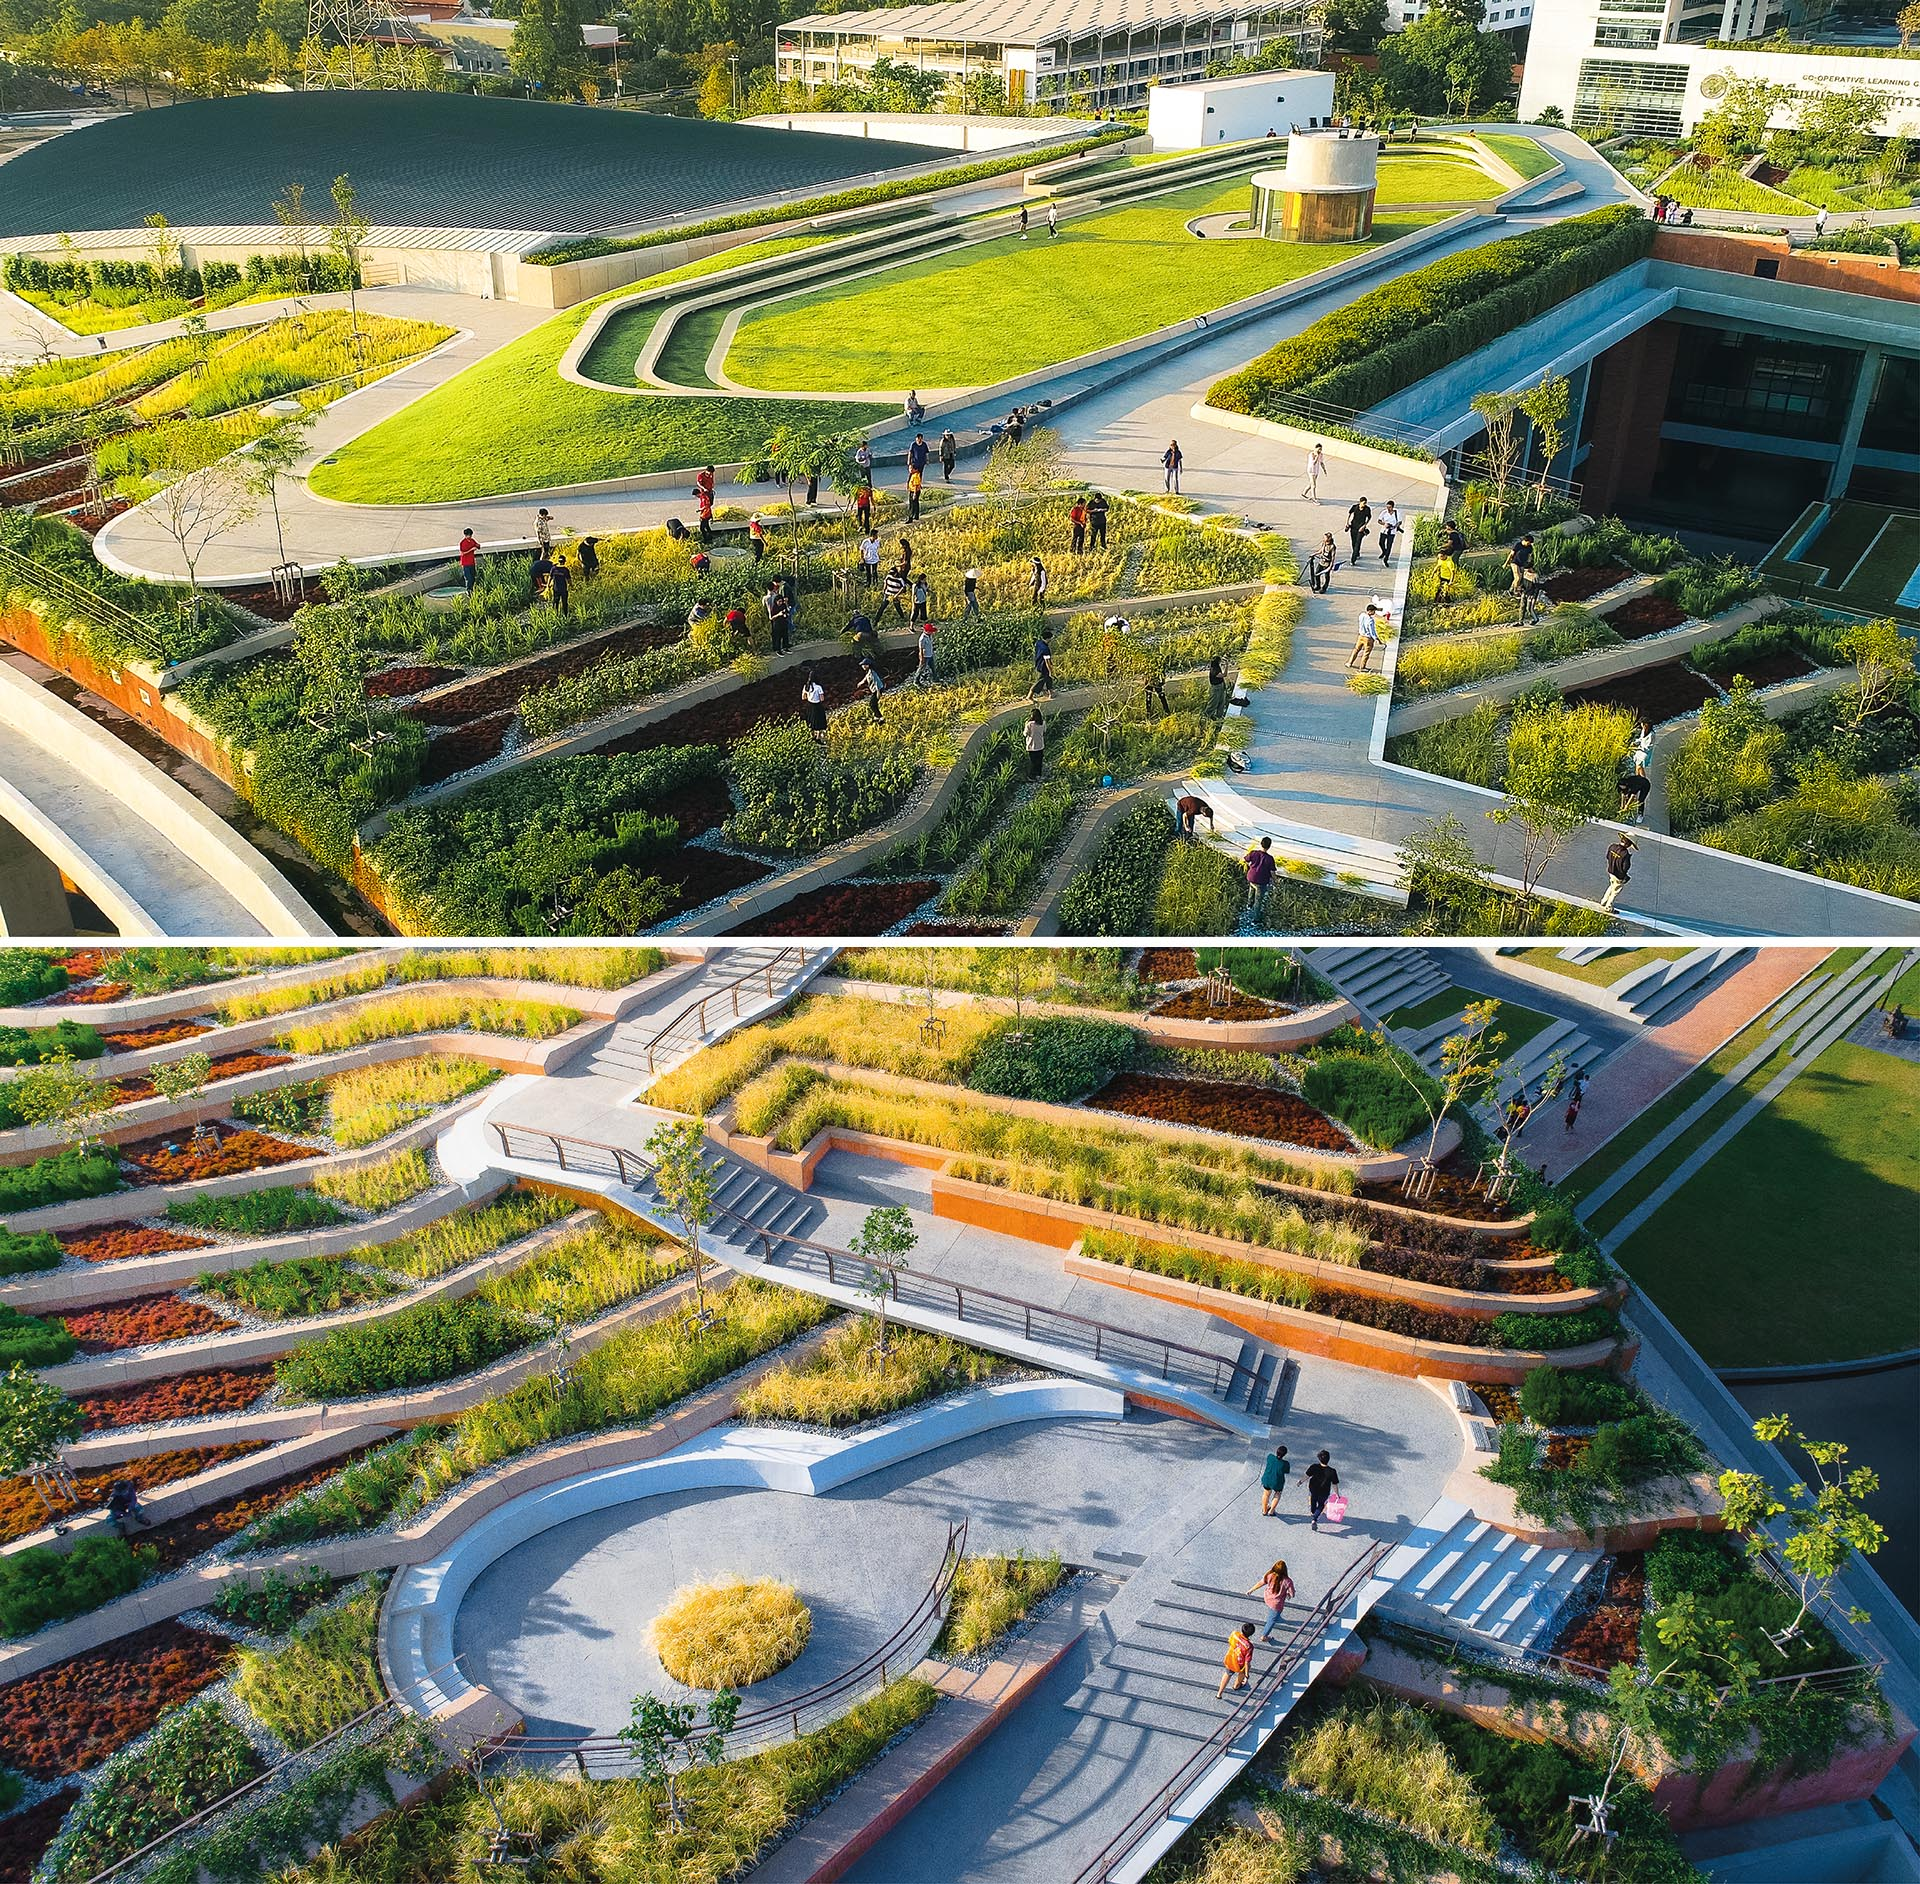 A terraced landscape creates an organic farm on an unused rooftop.